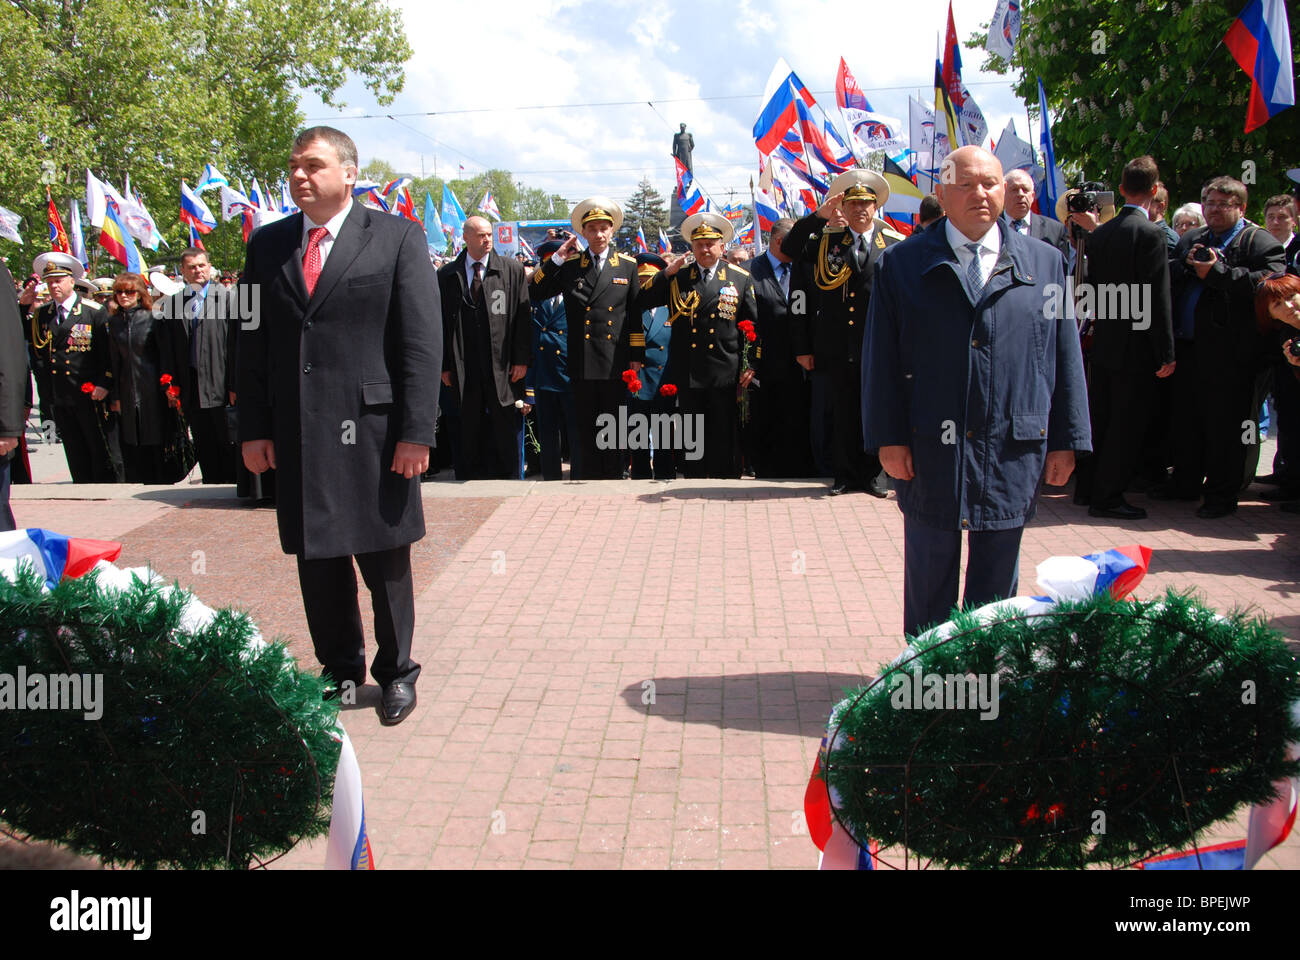 Festivities marking 225th anniversary of Russian Black Sea Fleet - Stock Image